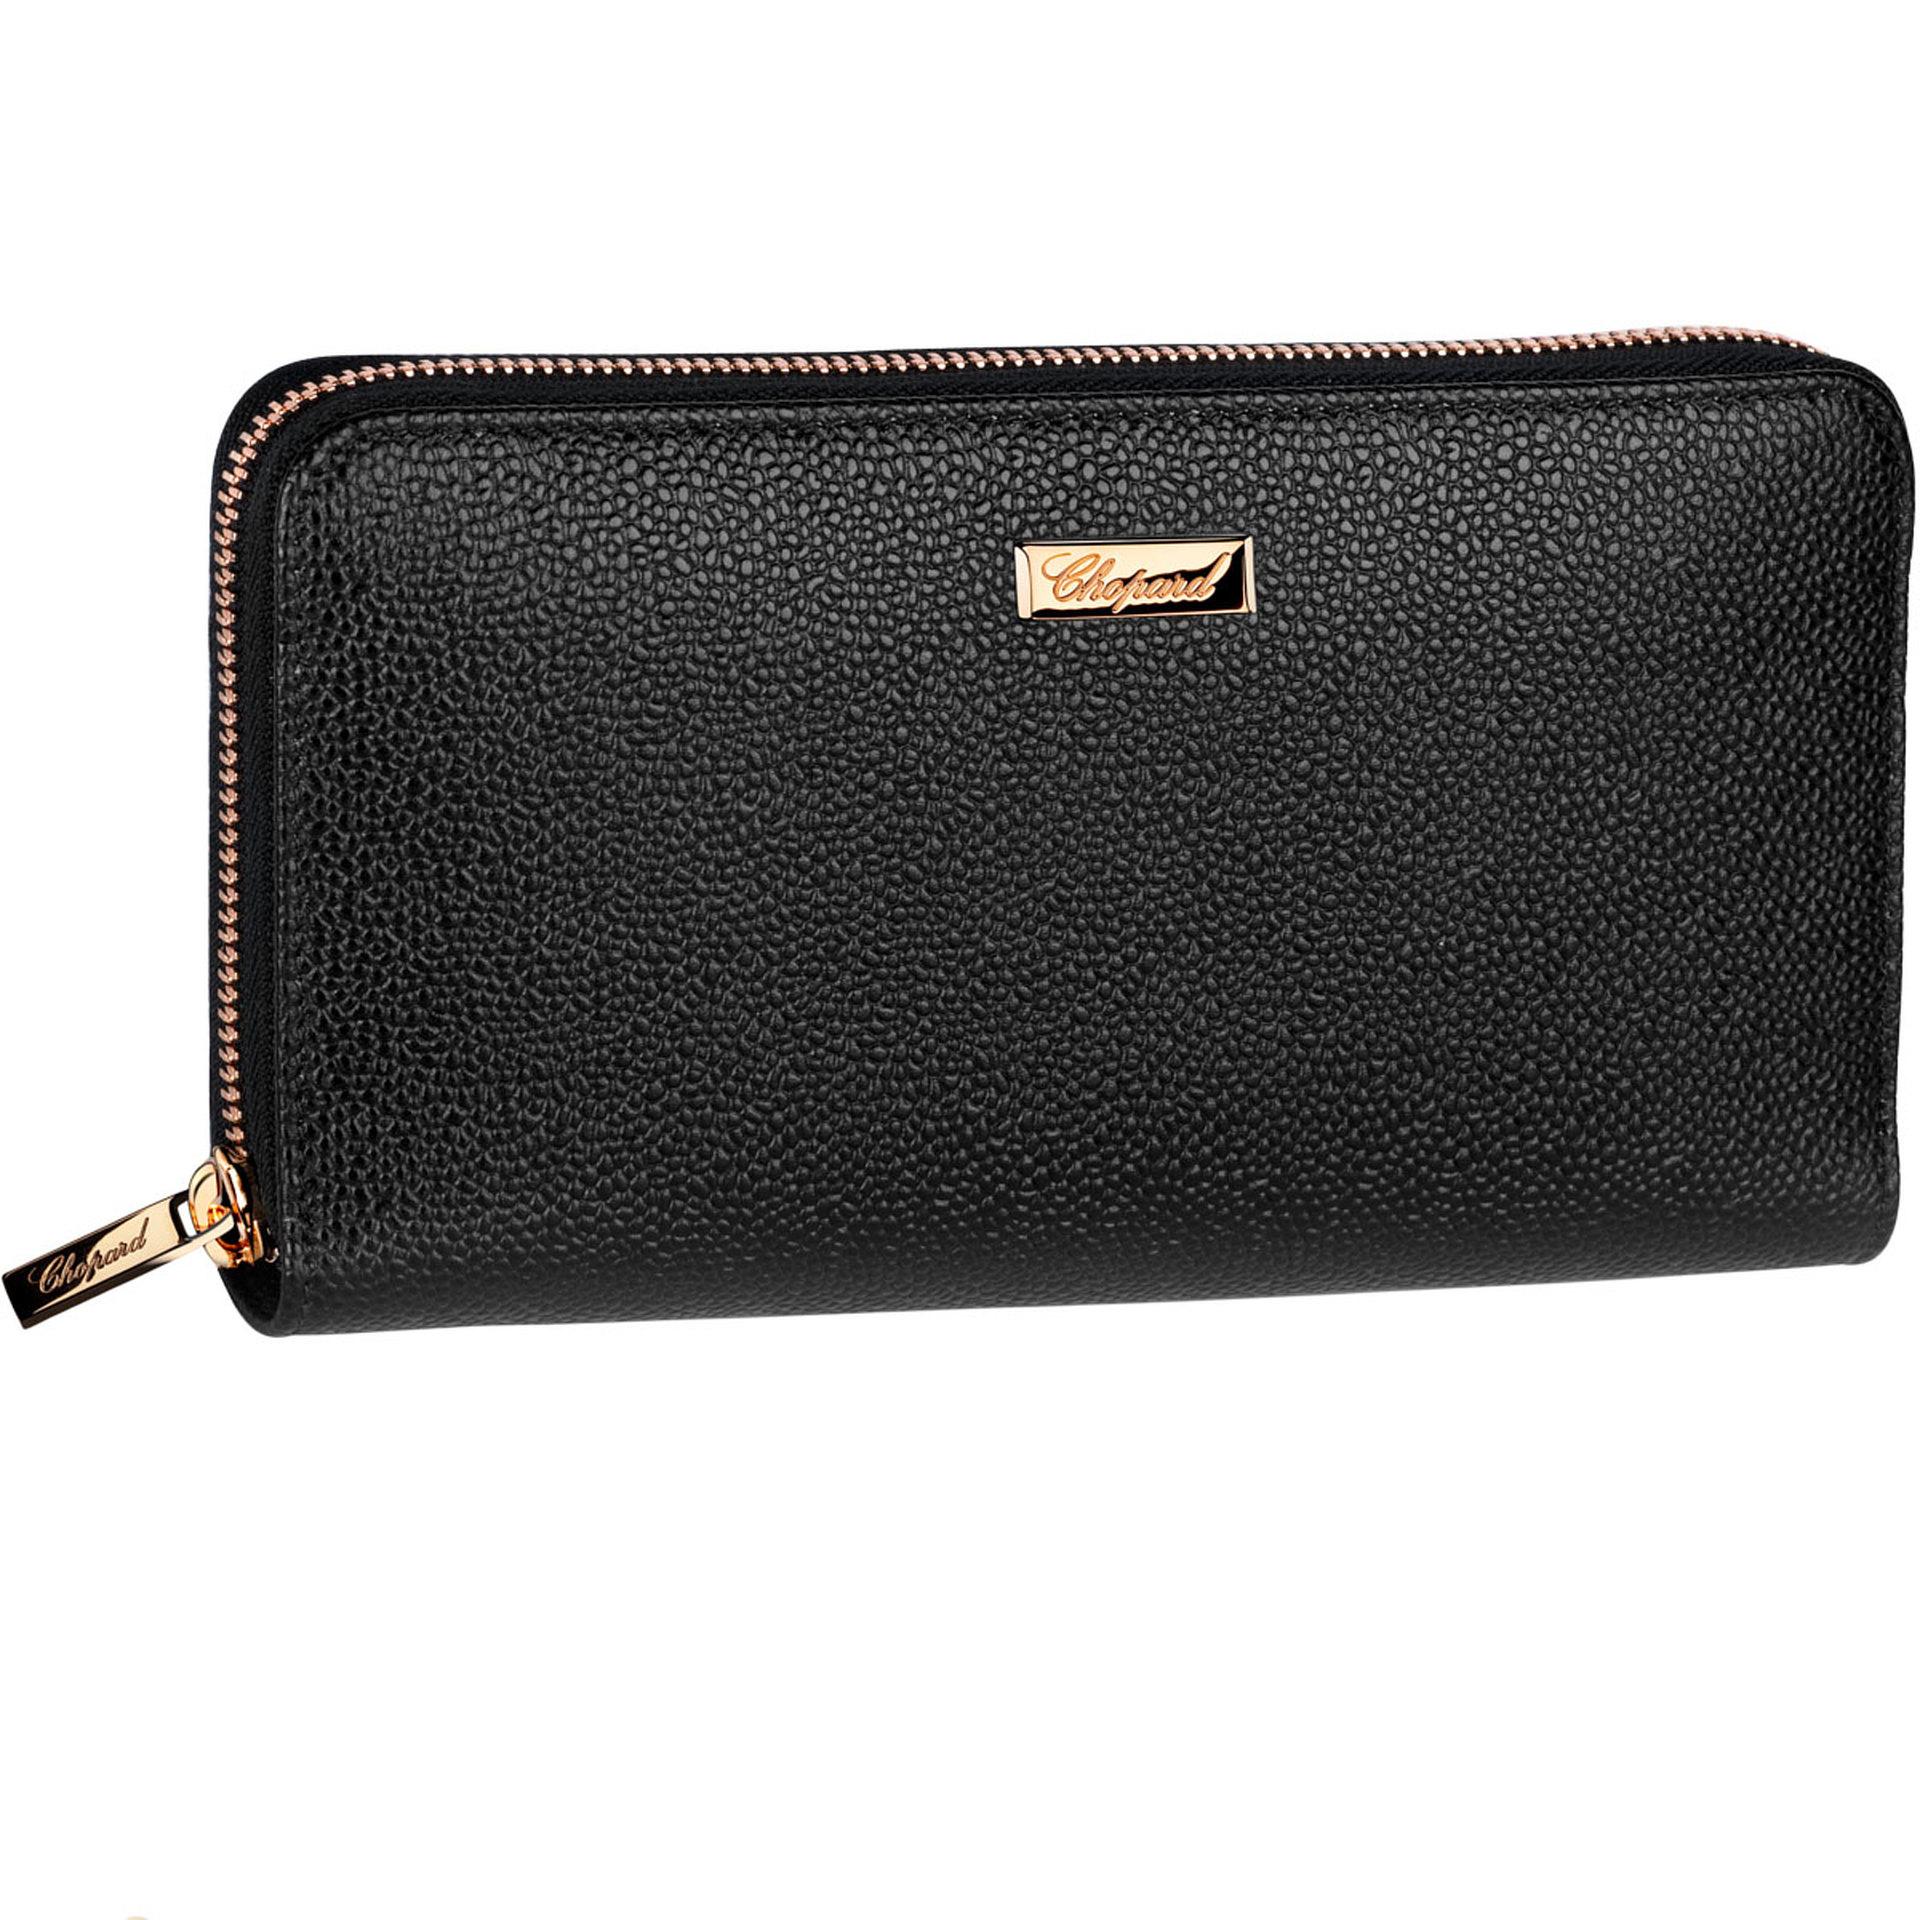 Chopard Black leather Caroline medium zip wallet